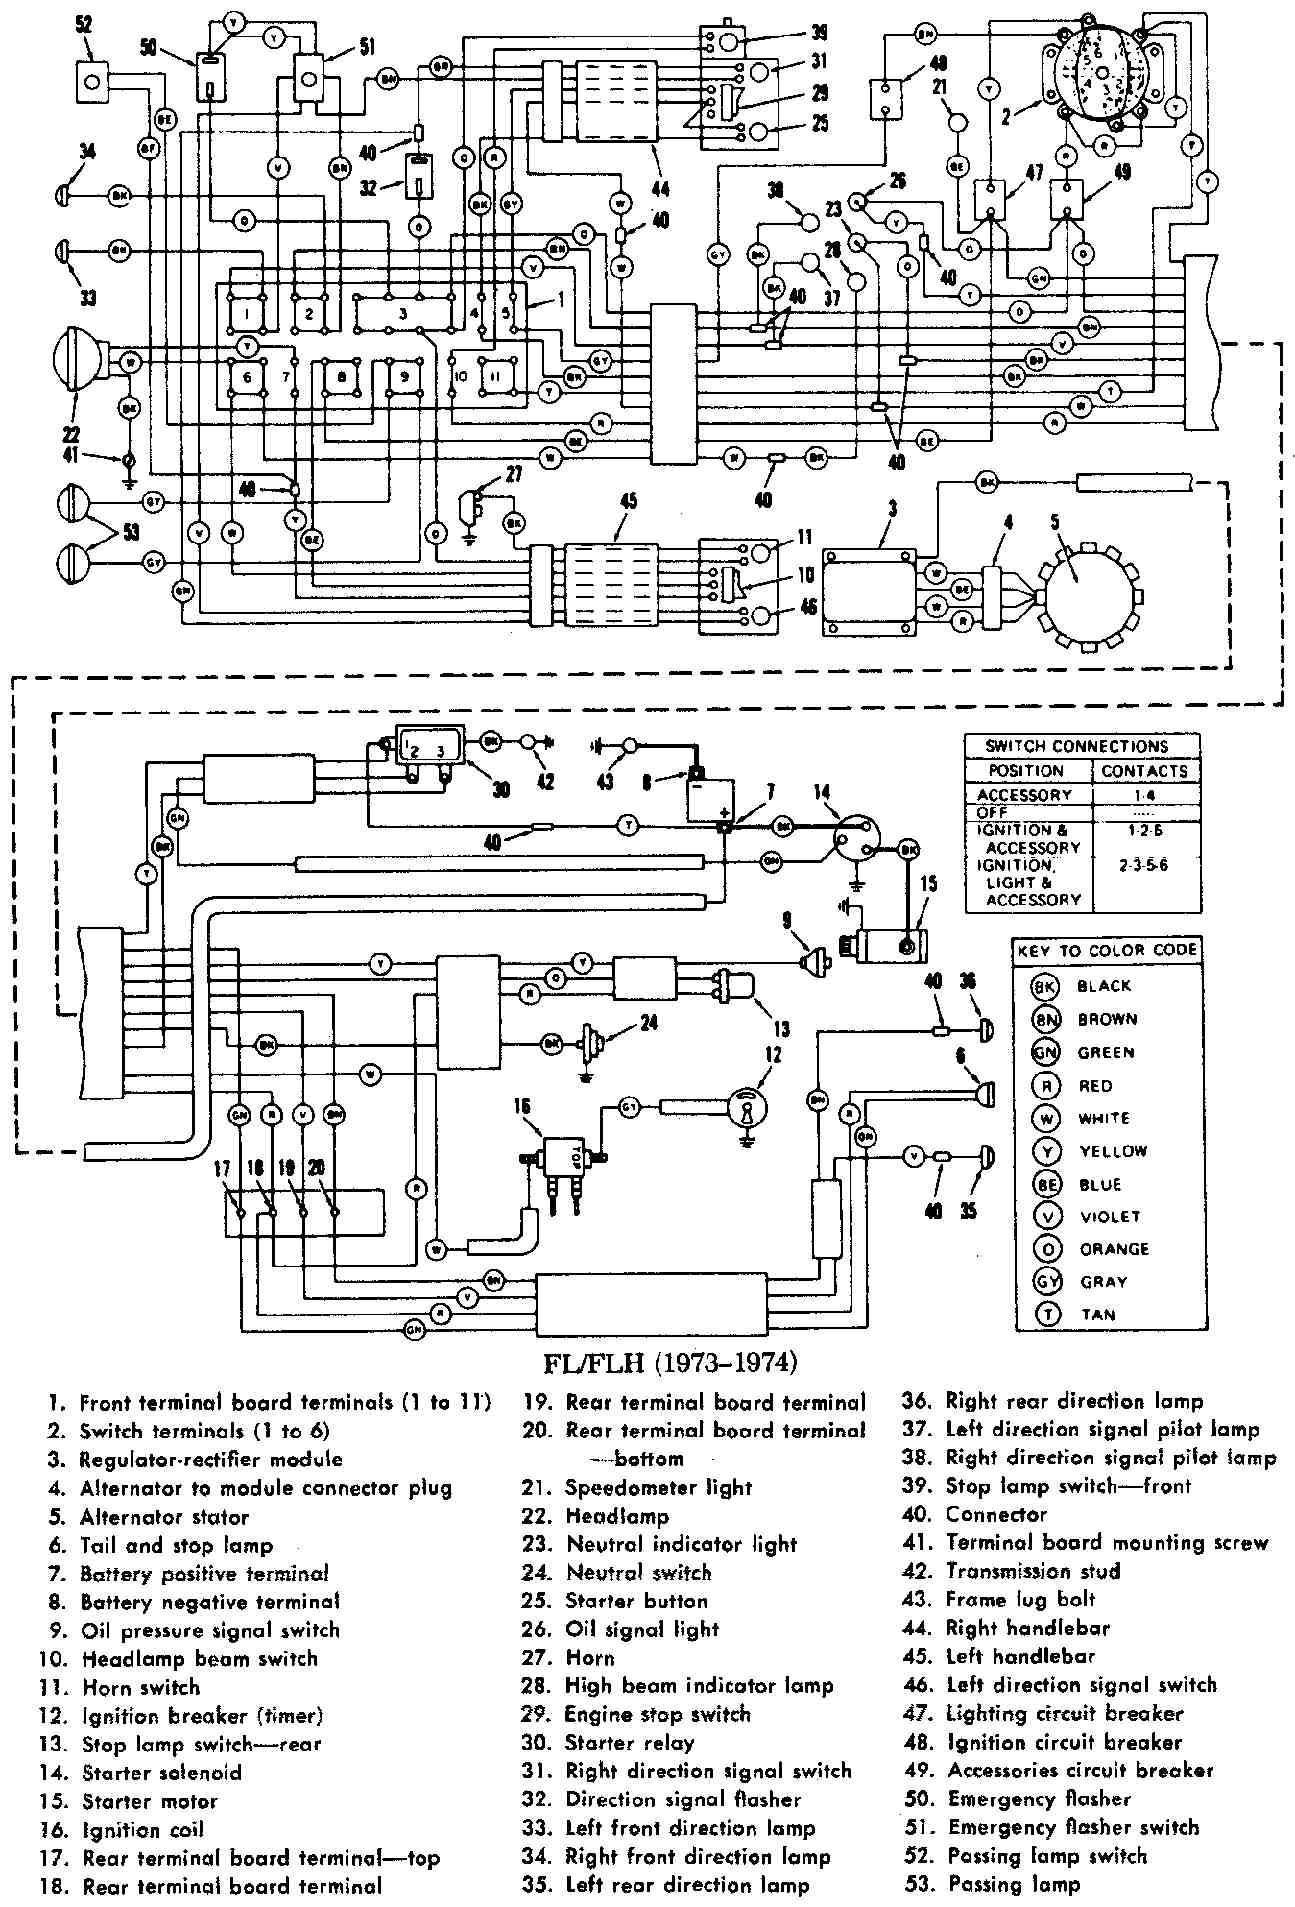 Free Buick Wiring Diagrams 1968 Get Free Image About Wiring Diagram